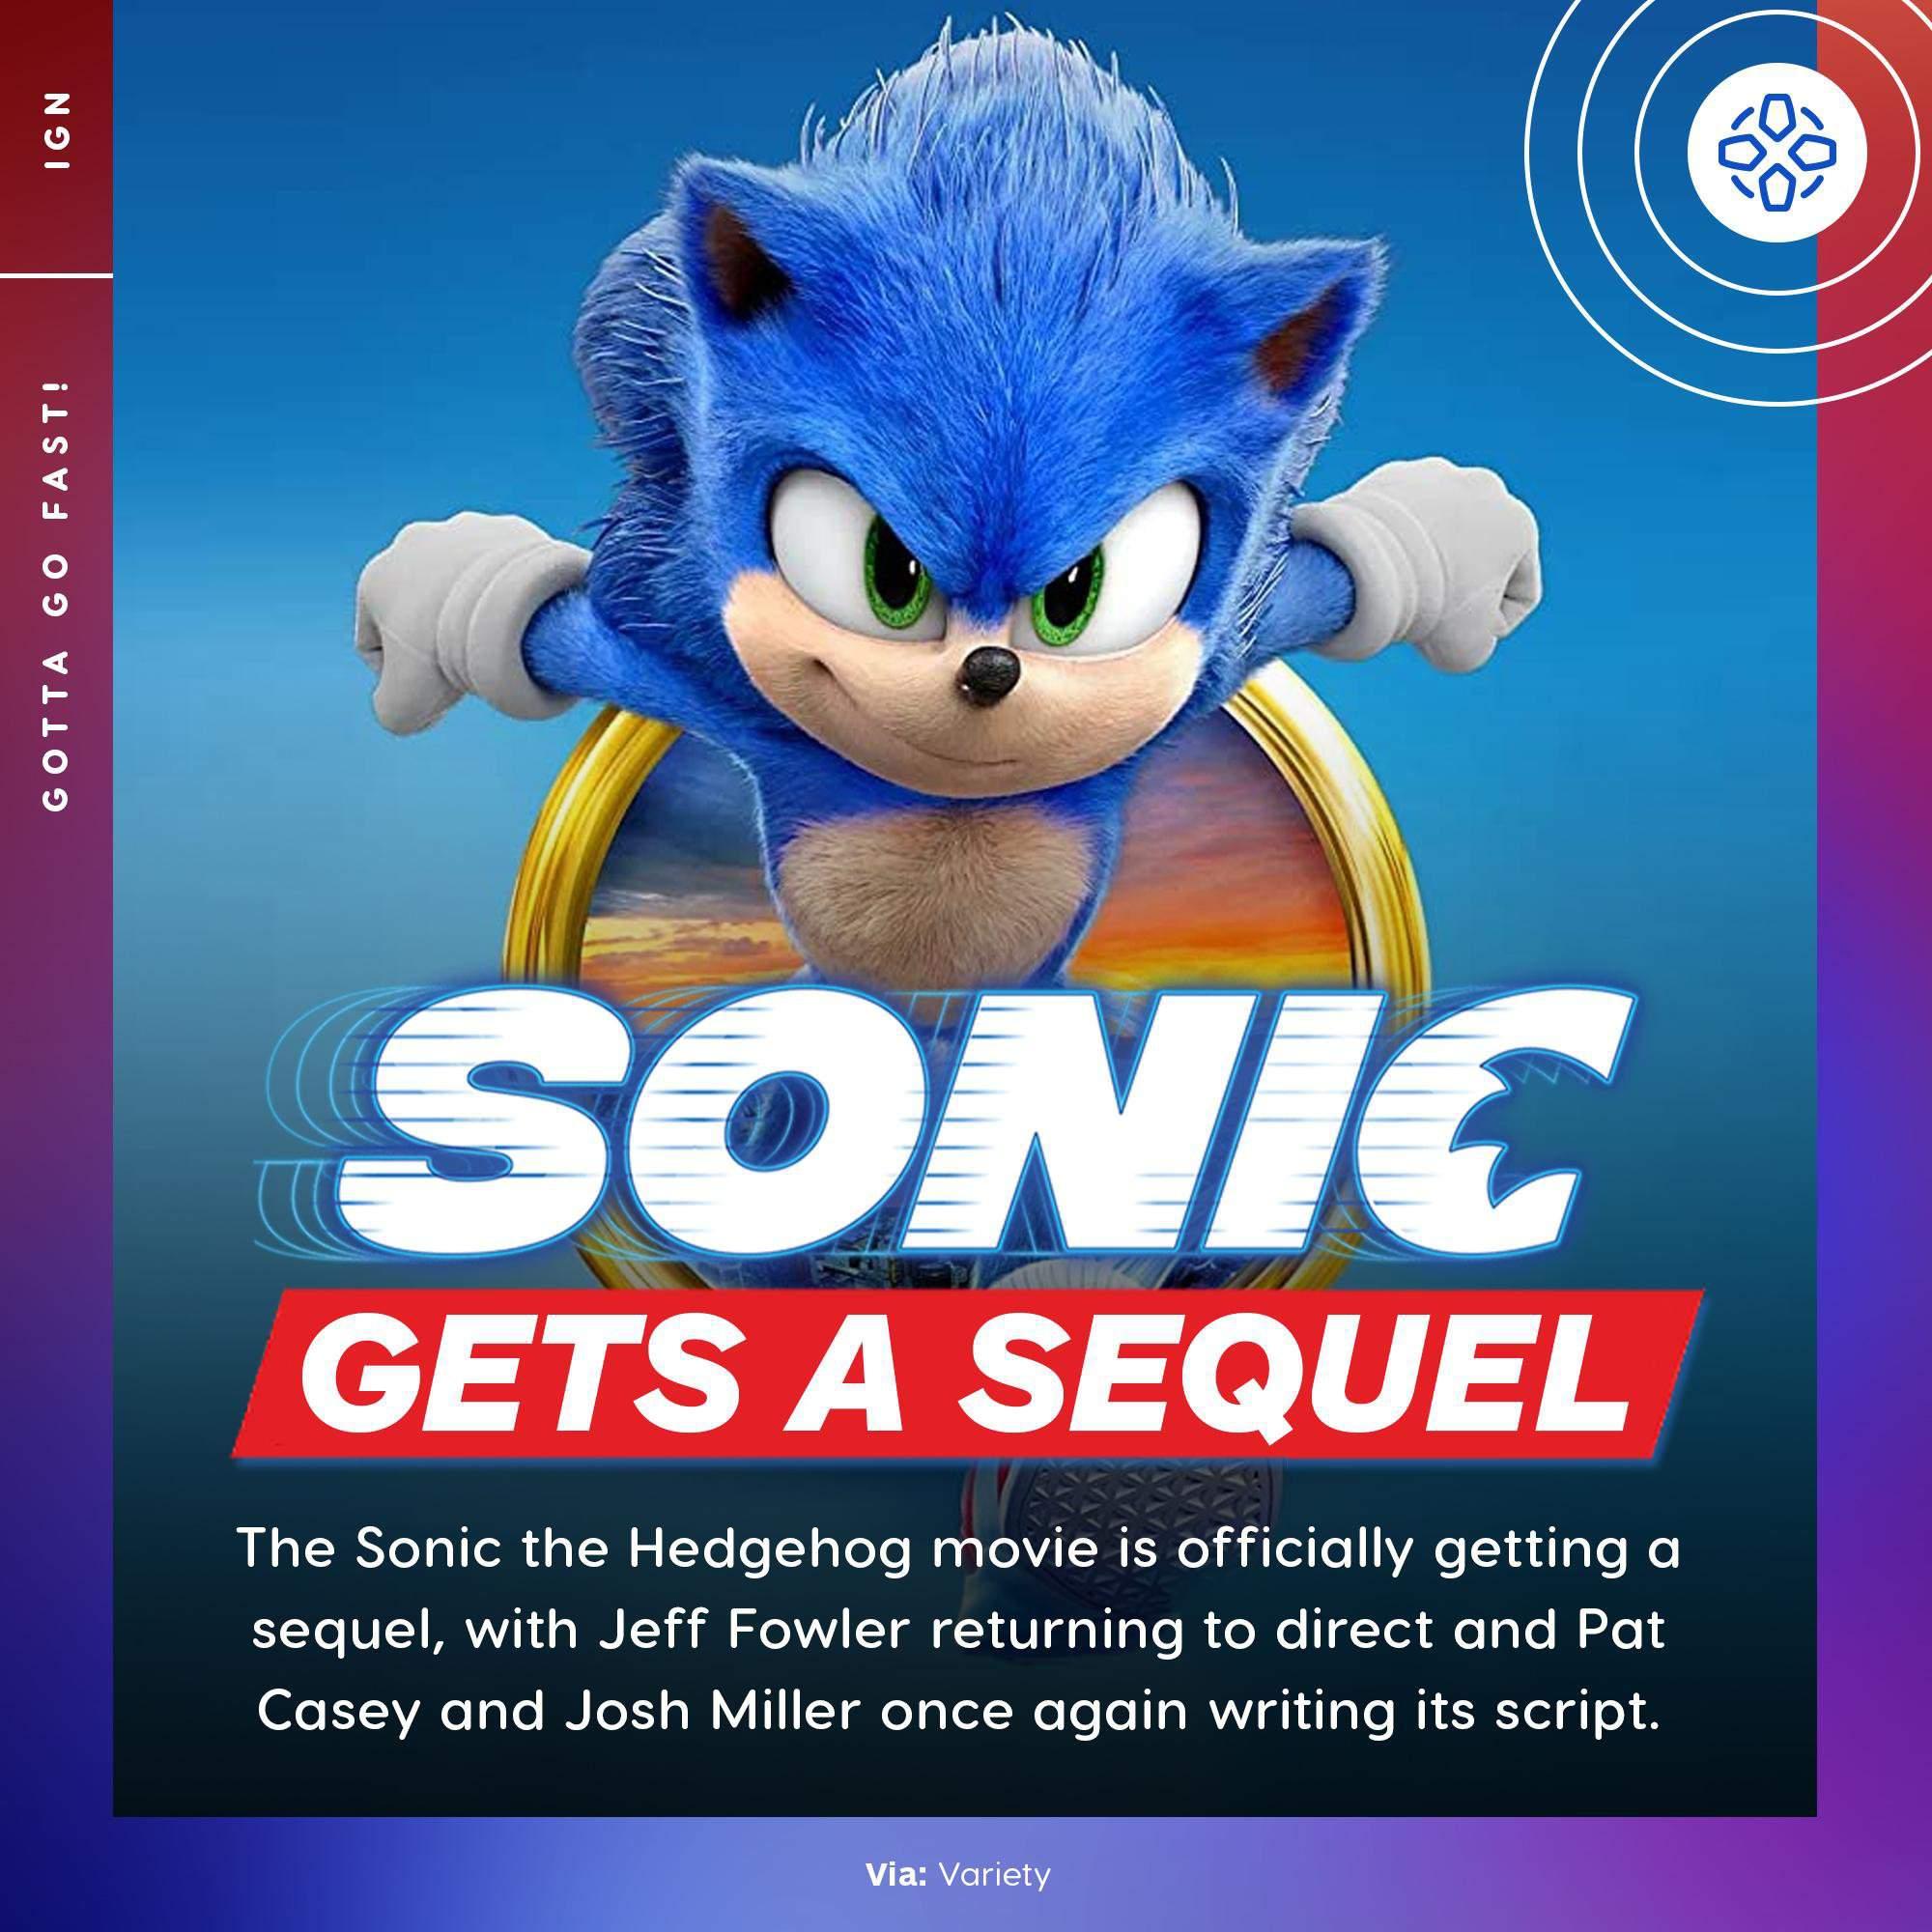 sonic the hedgehog movie 2 logo